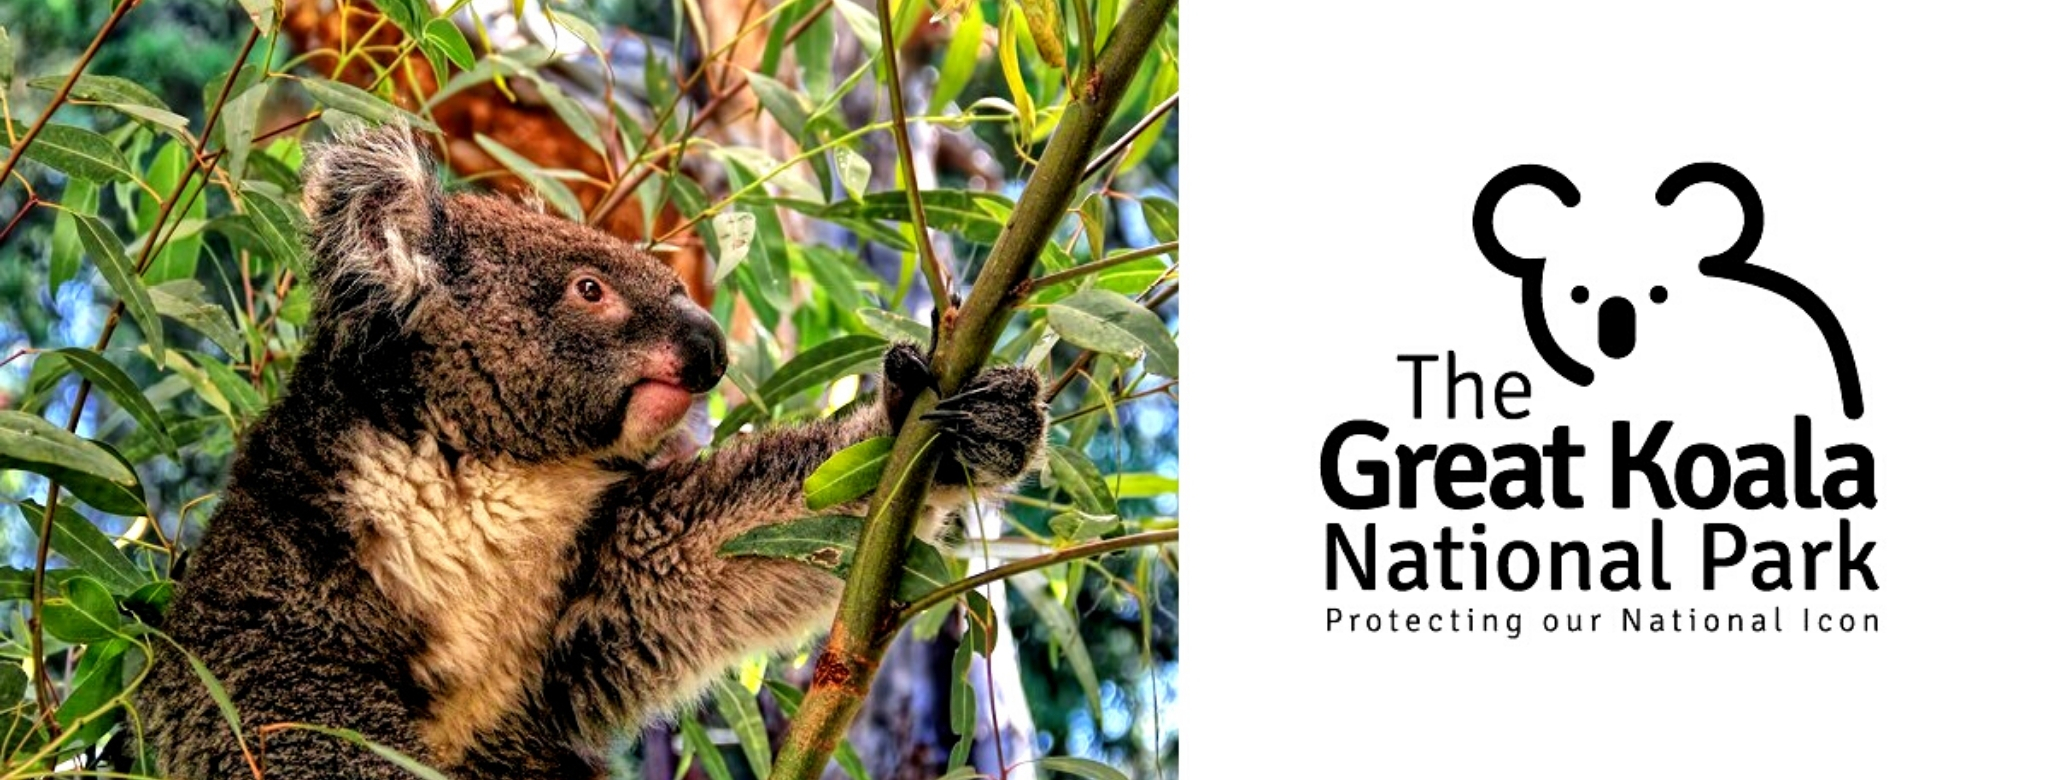 The Great Koala National Park, New South Wales mid-north coast